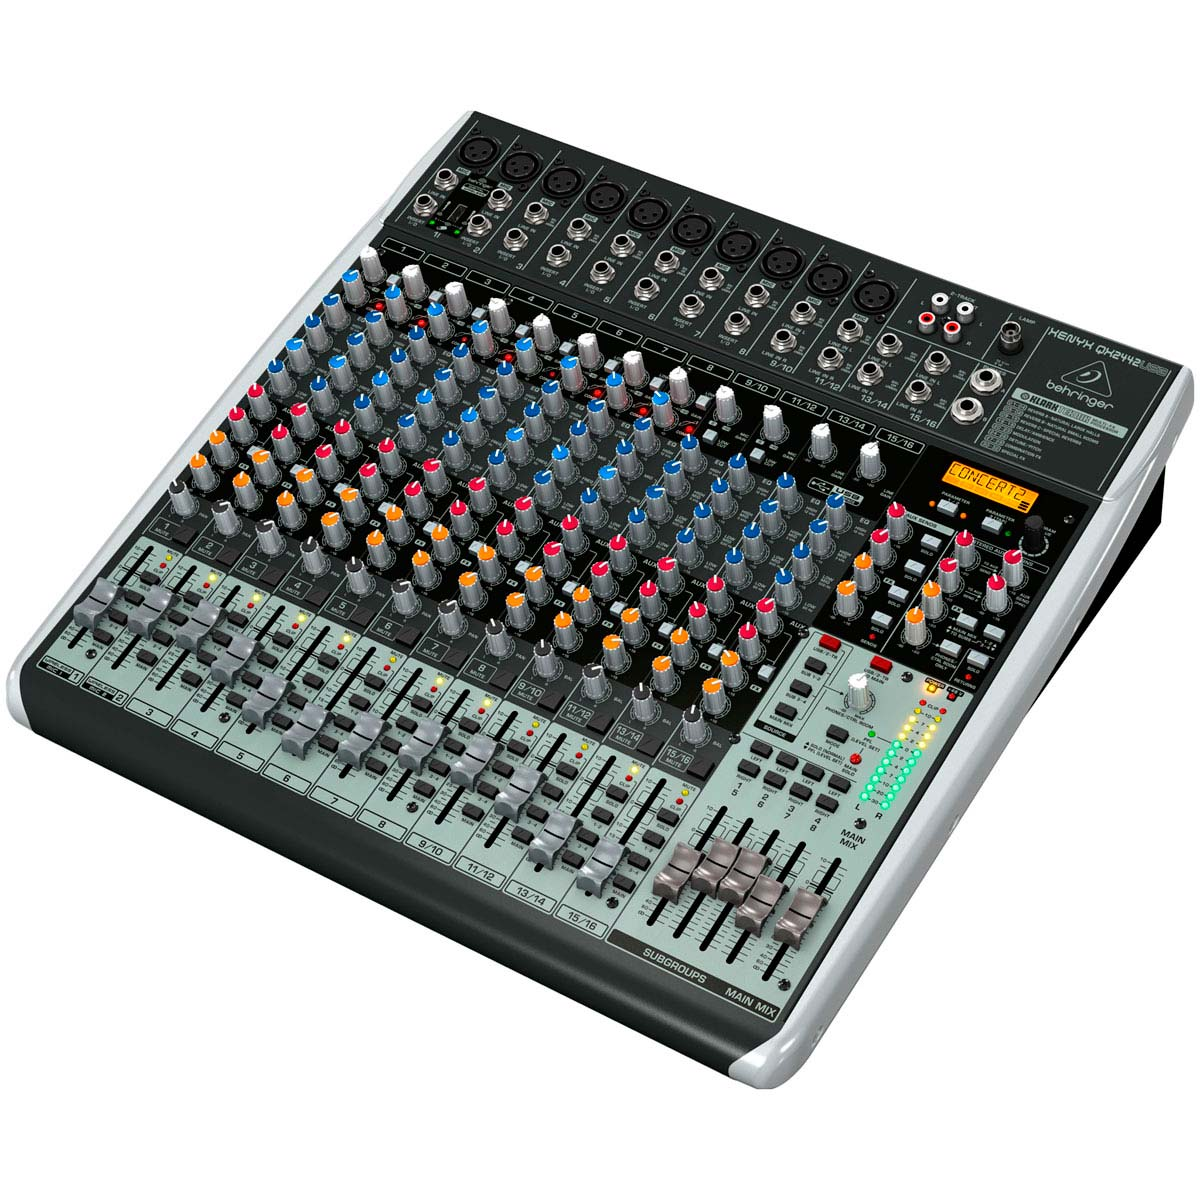 Mesa de Som 24 Canais Balanceados (10 XLR + 14P10) c/ USB / Efeito / Phantom / 4 Auxiliares - Xenyx QX 2442 USB Behringer